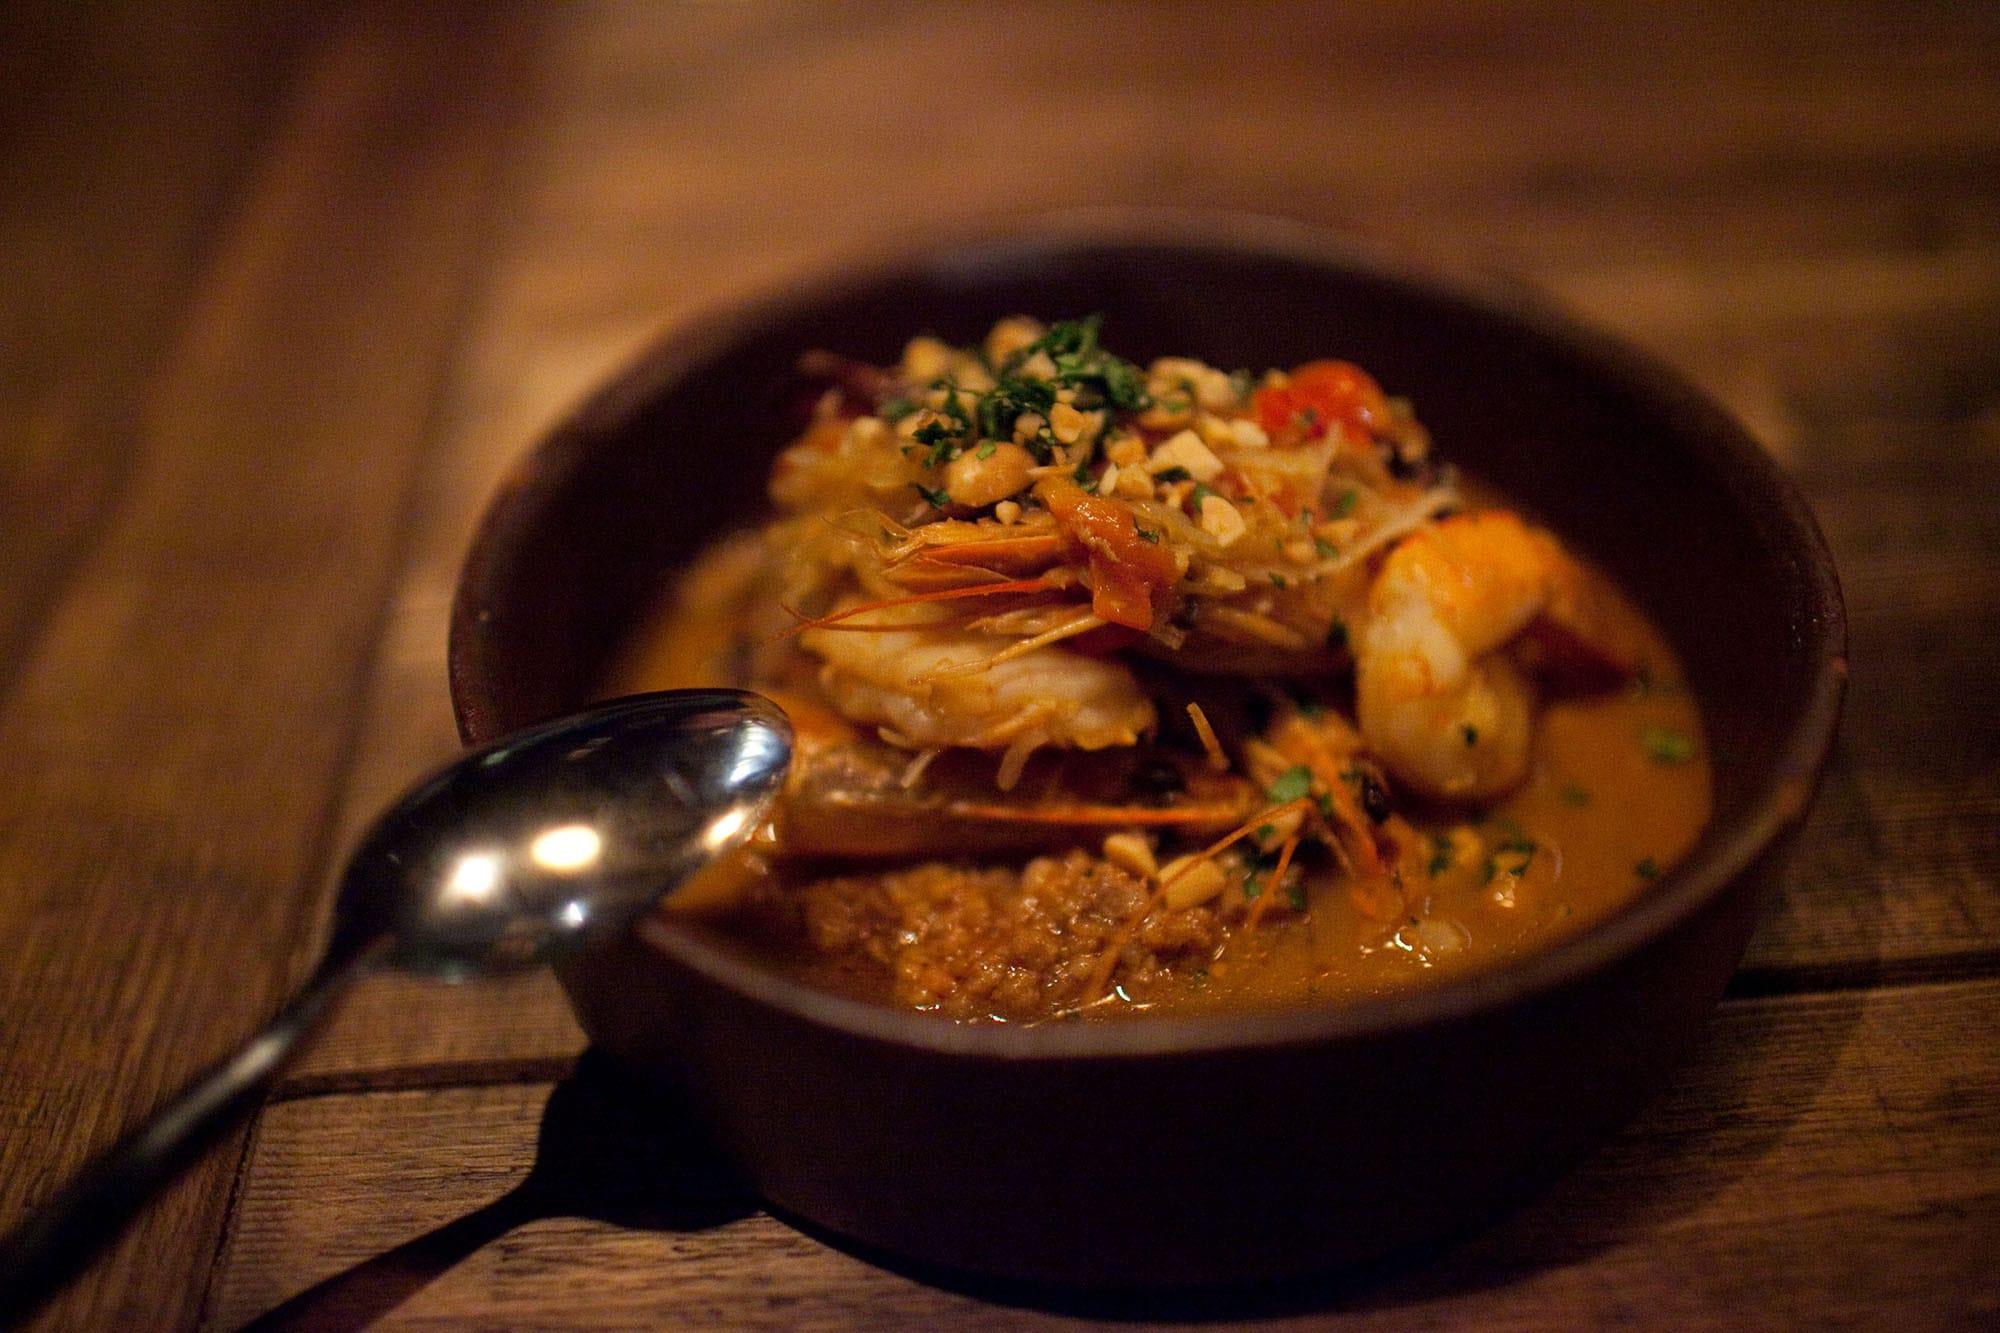 Girl and the Goat - Sauteed shrimp with peanut pork ragu, shiitake, and spaghetti squash.